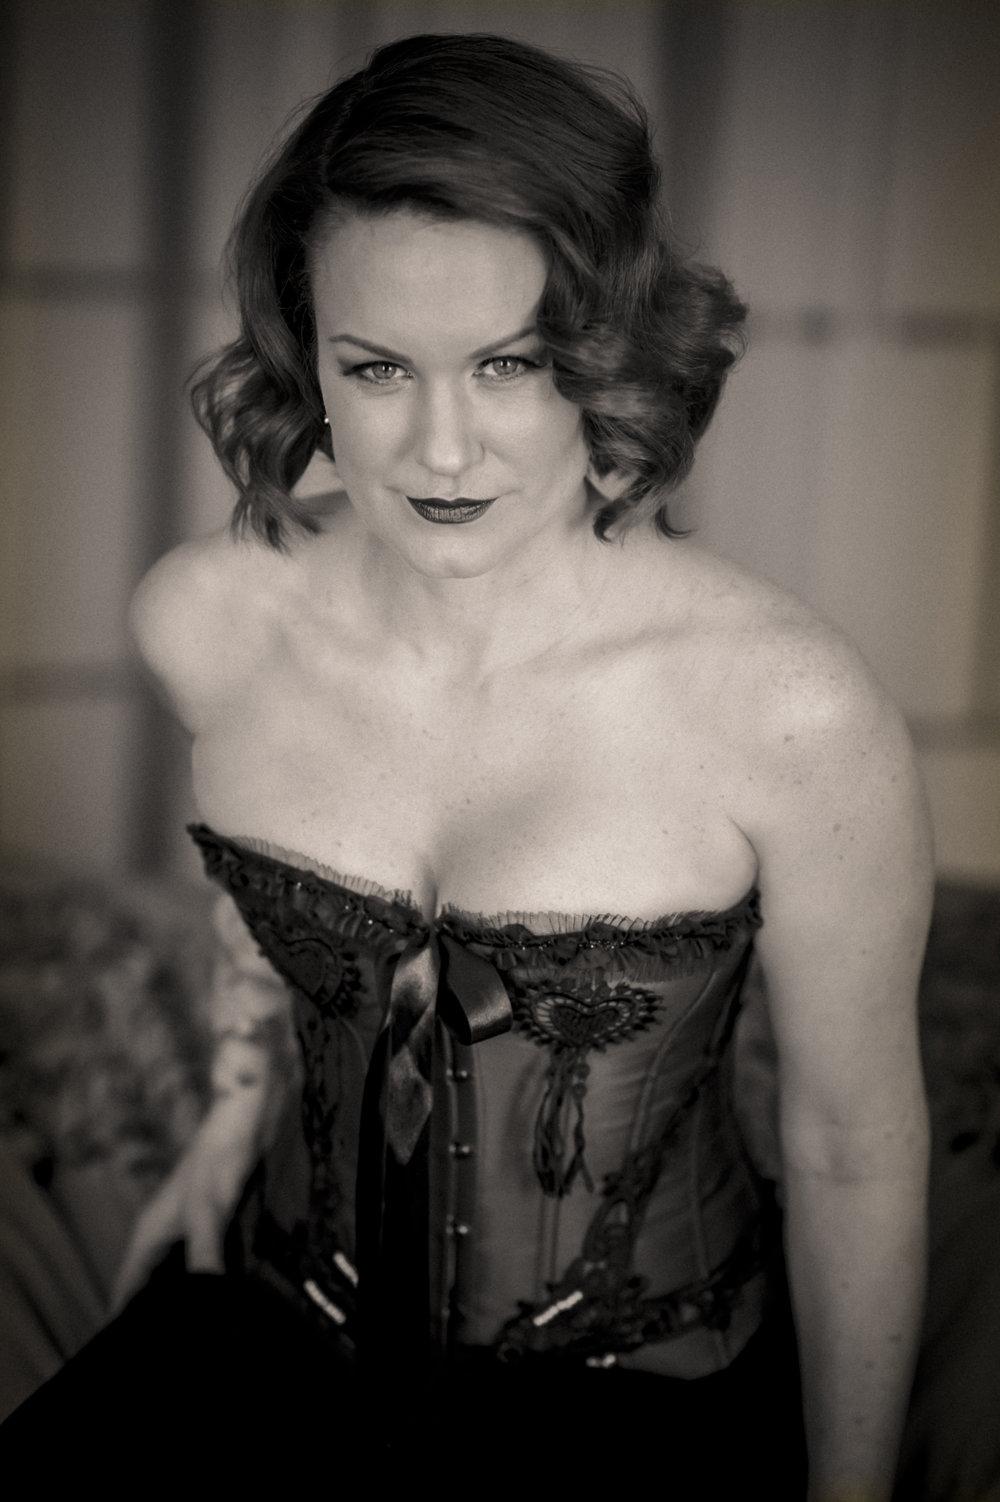 Marta-Hewson-Kim-Murkovich-boudoir-corset-black-and-white.jpg